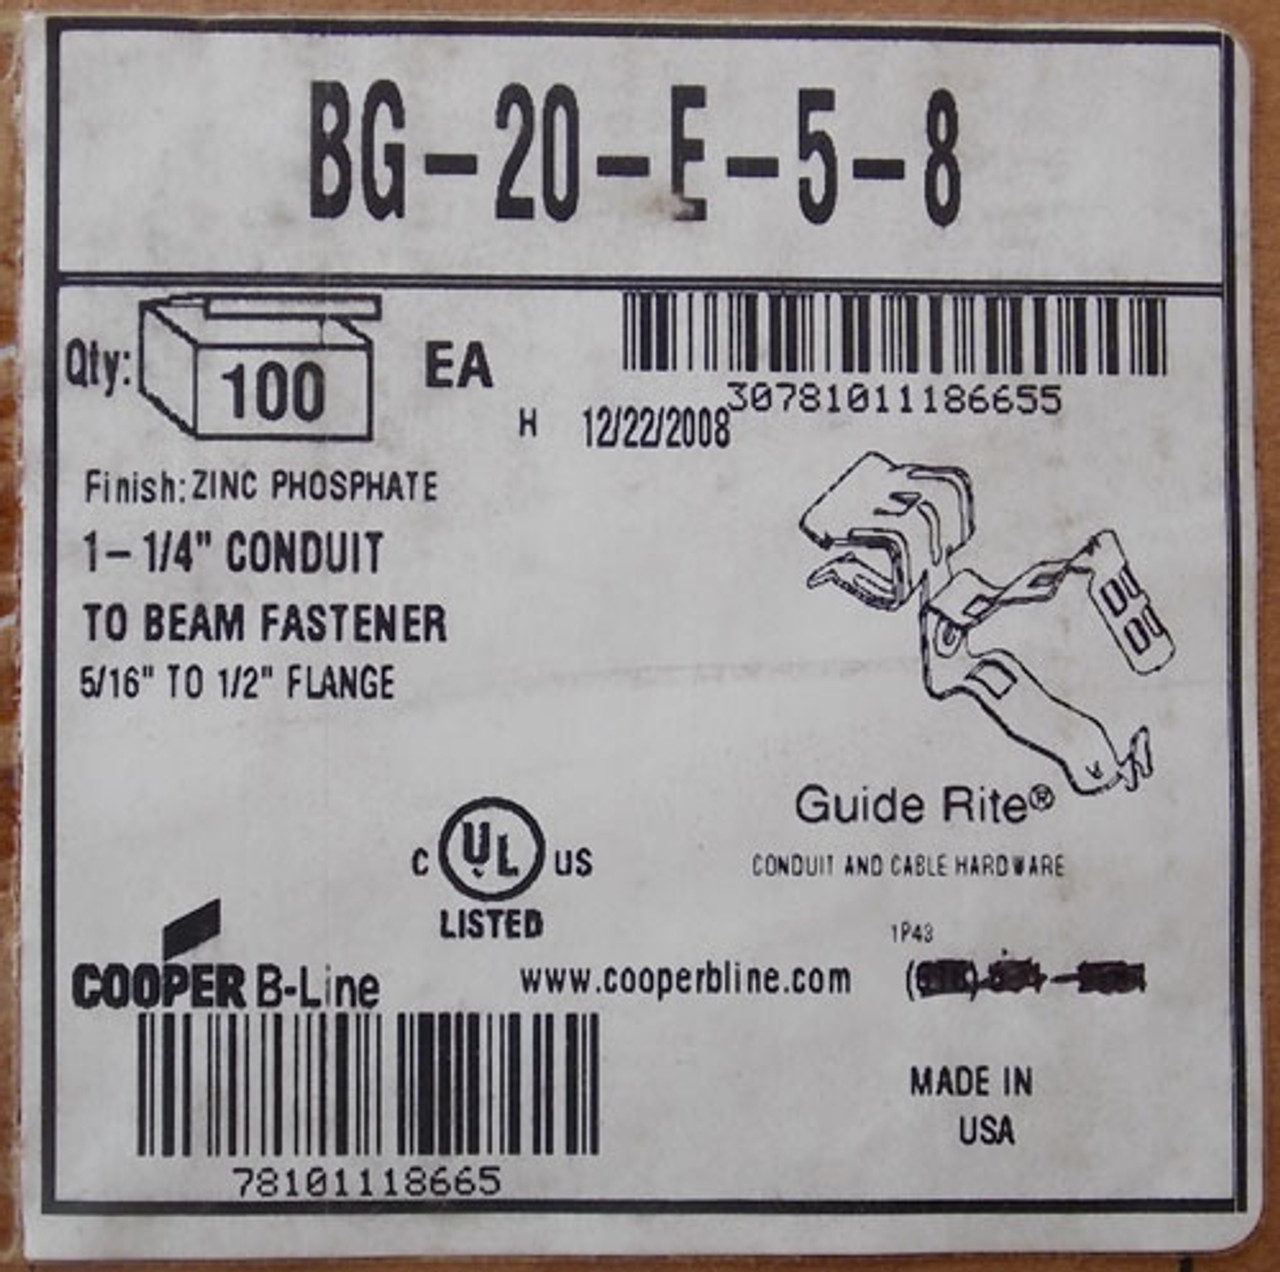 "Cooper BG-20-E-5-8 1-1/4"" Conduit to Beam Fastener Zinc Phosphate (Lot of 100) - New"